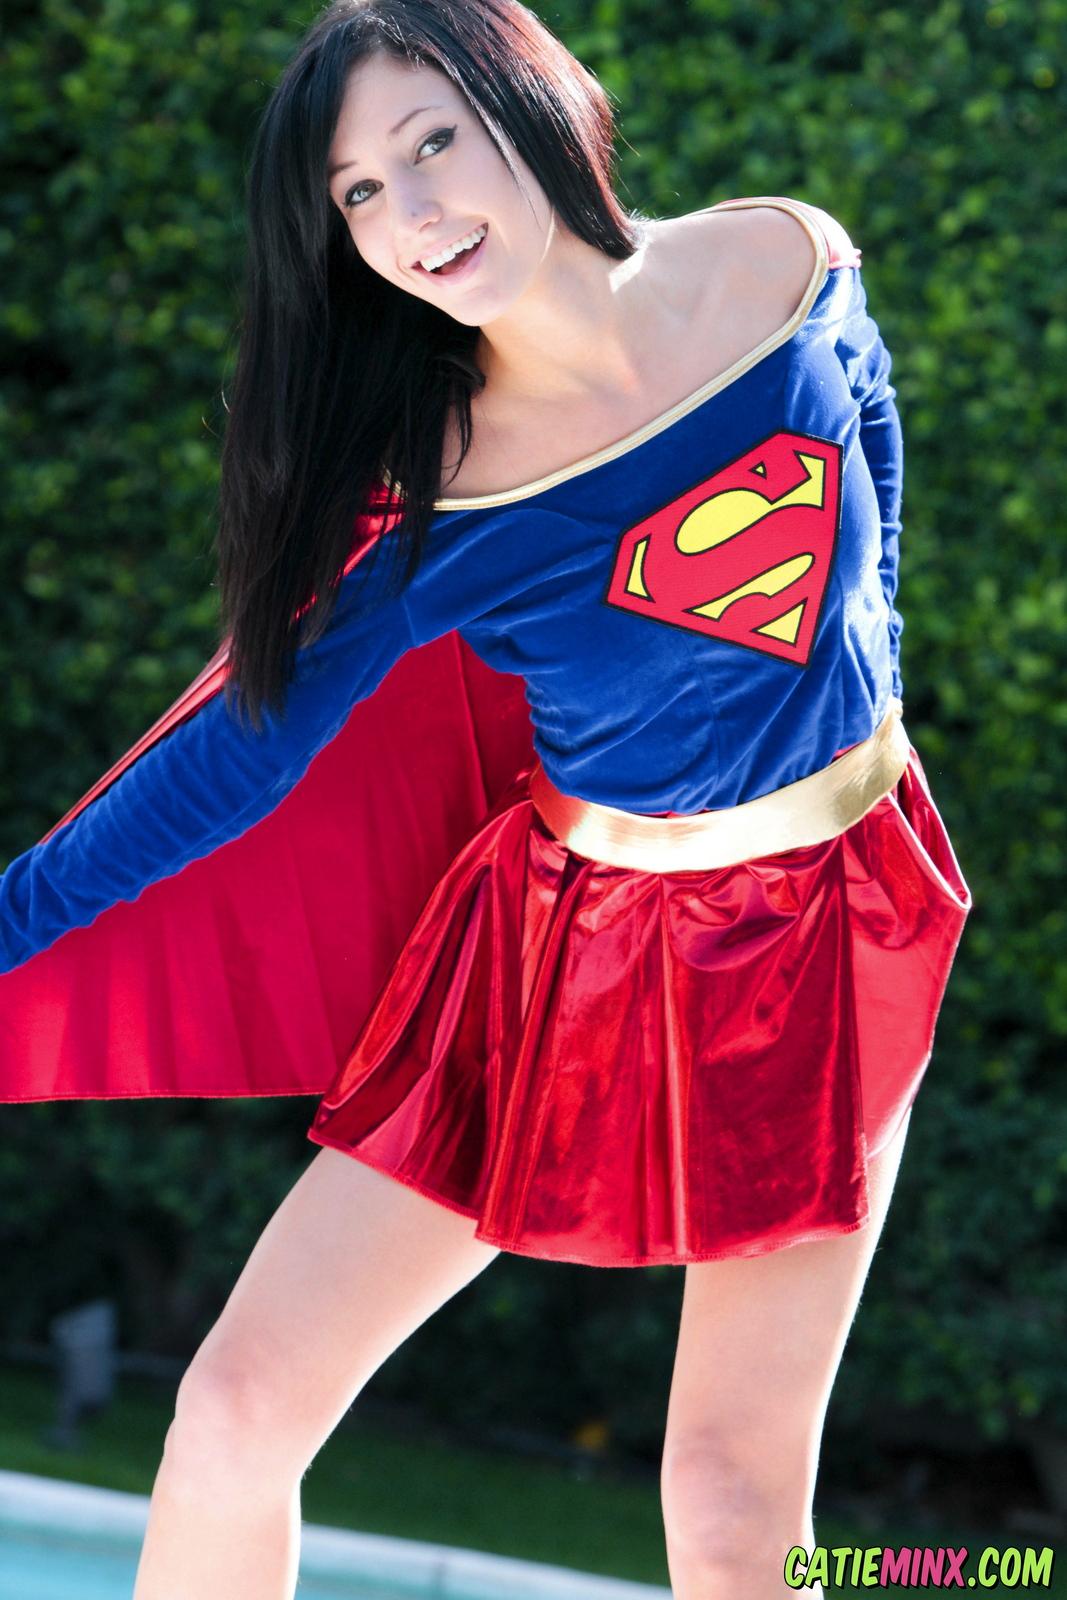 catie-minx-supergirl-costiume-poolside-young-brunette-nude-12